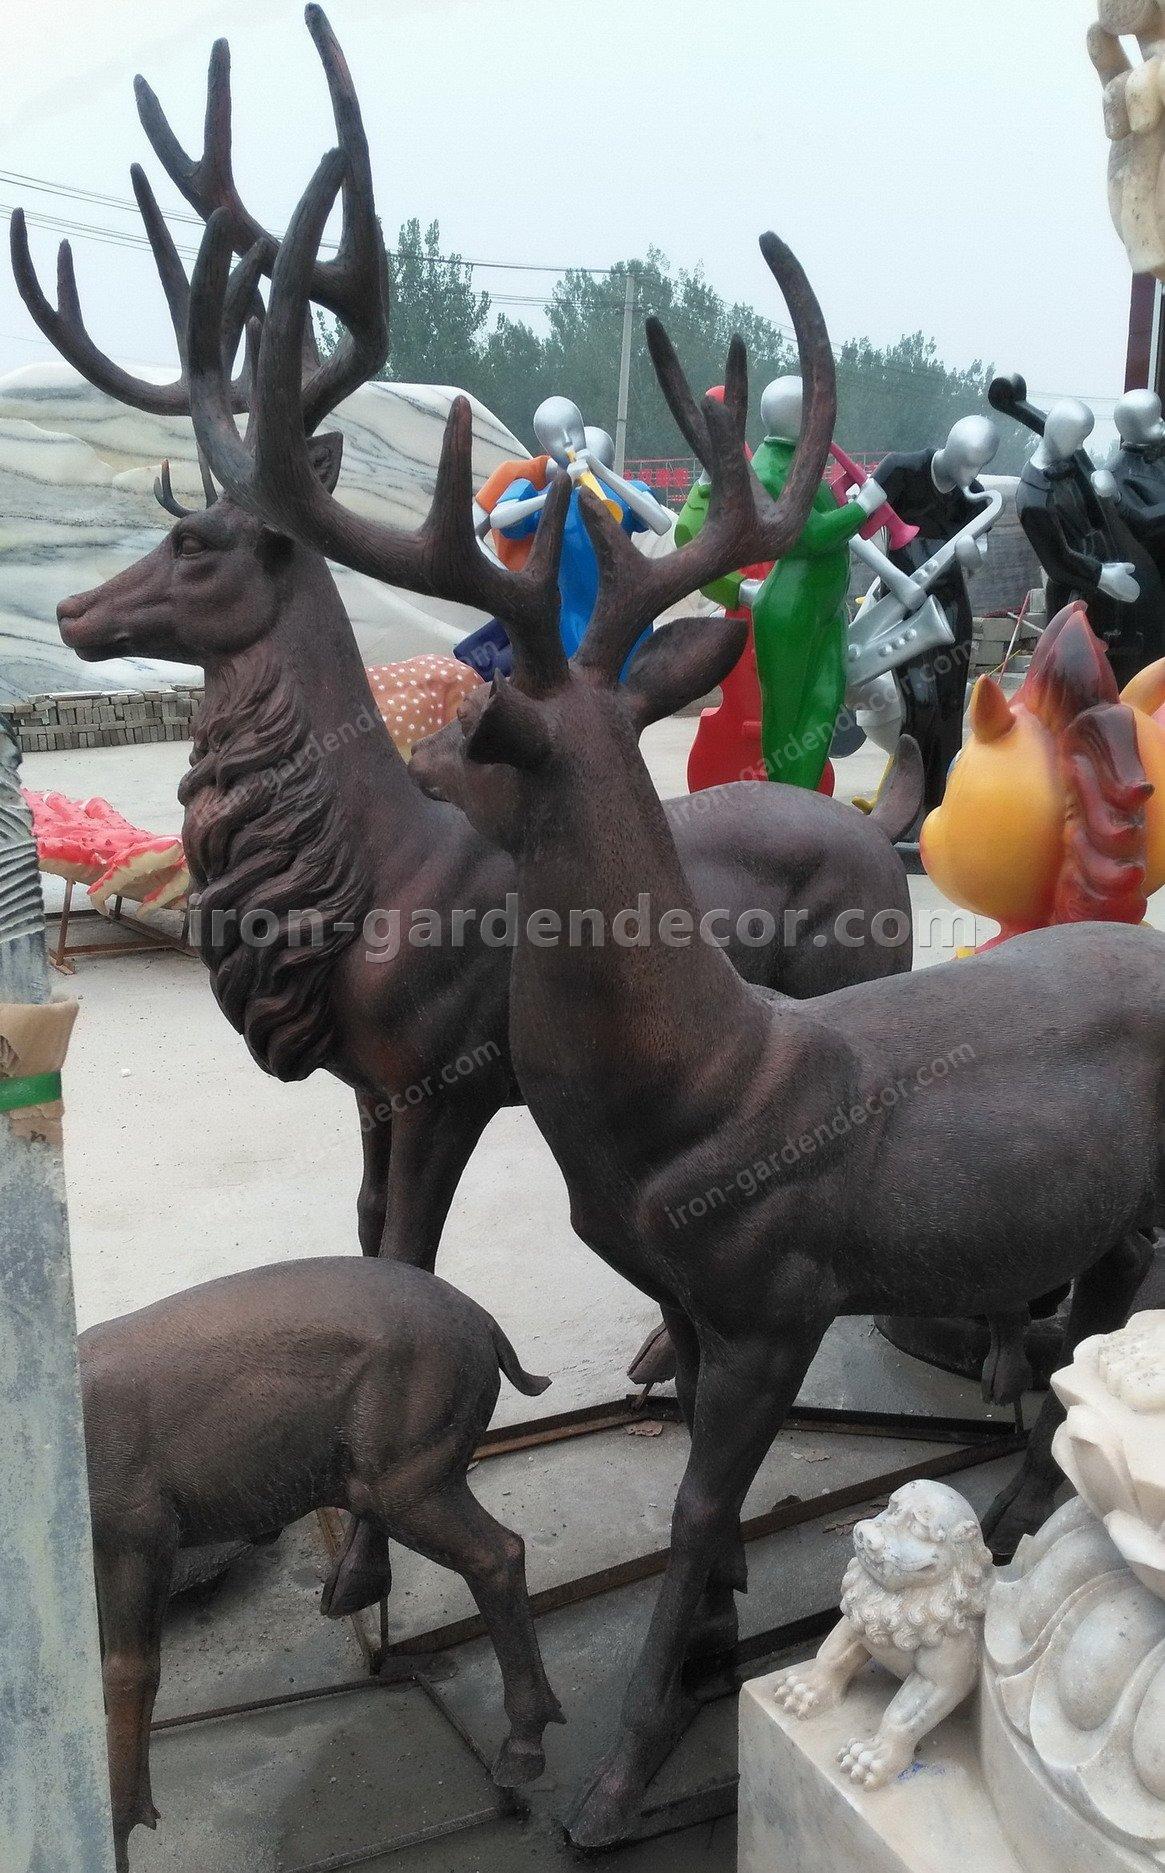 Home decoration outdoor garden stage animal resin statue fiberglass-DEER FAMILY FS076 (10)